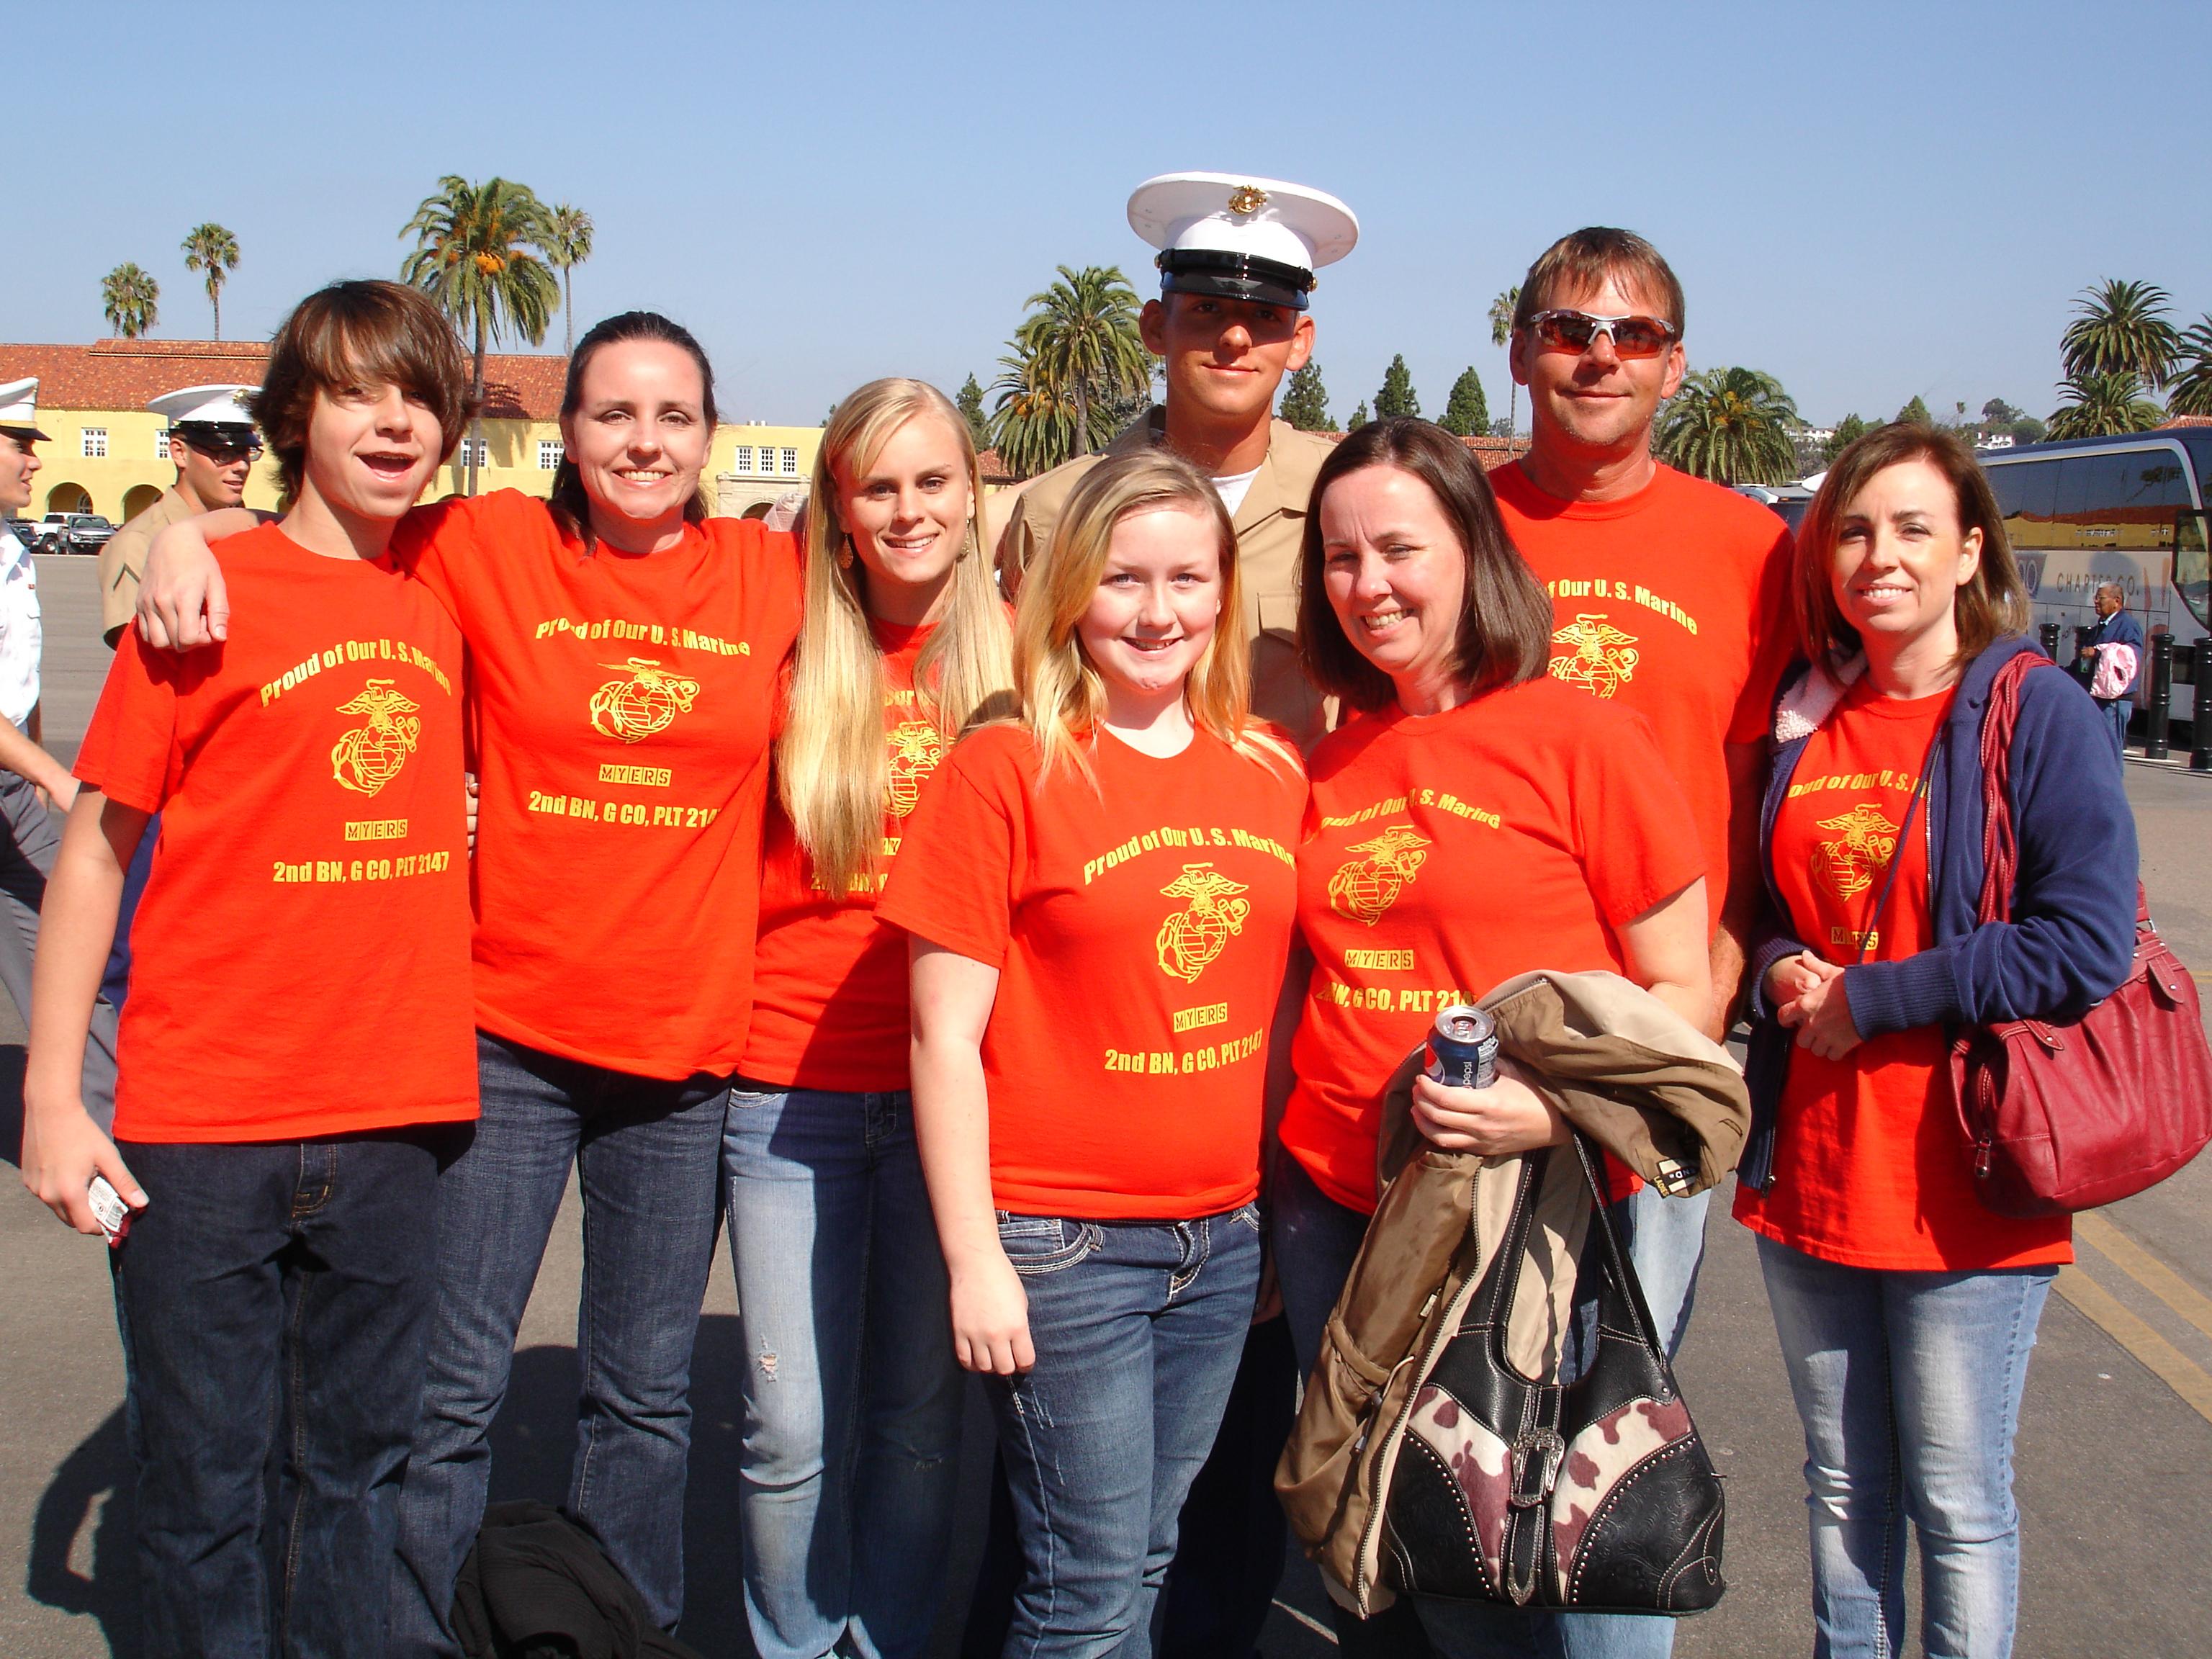 custom tshirts for graduation day at marine corps boot